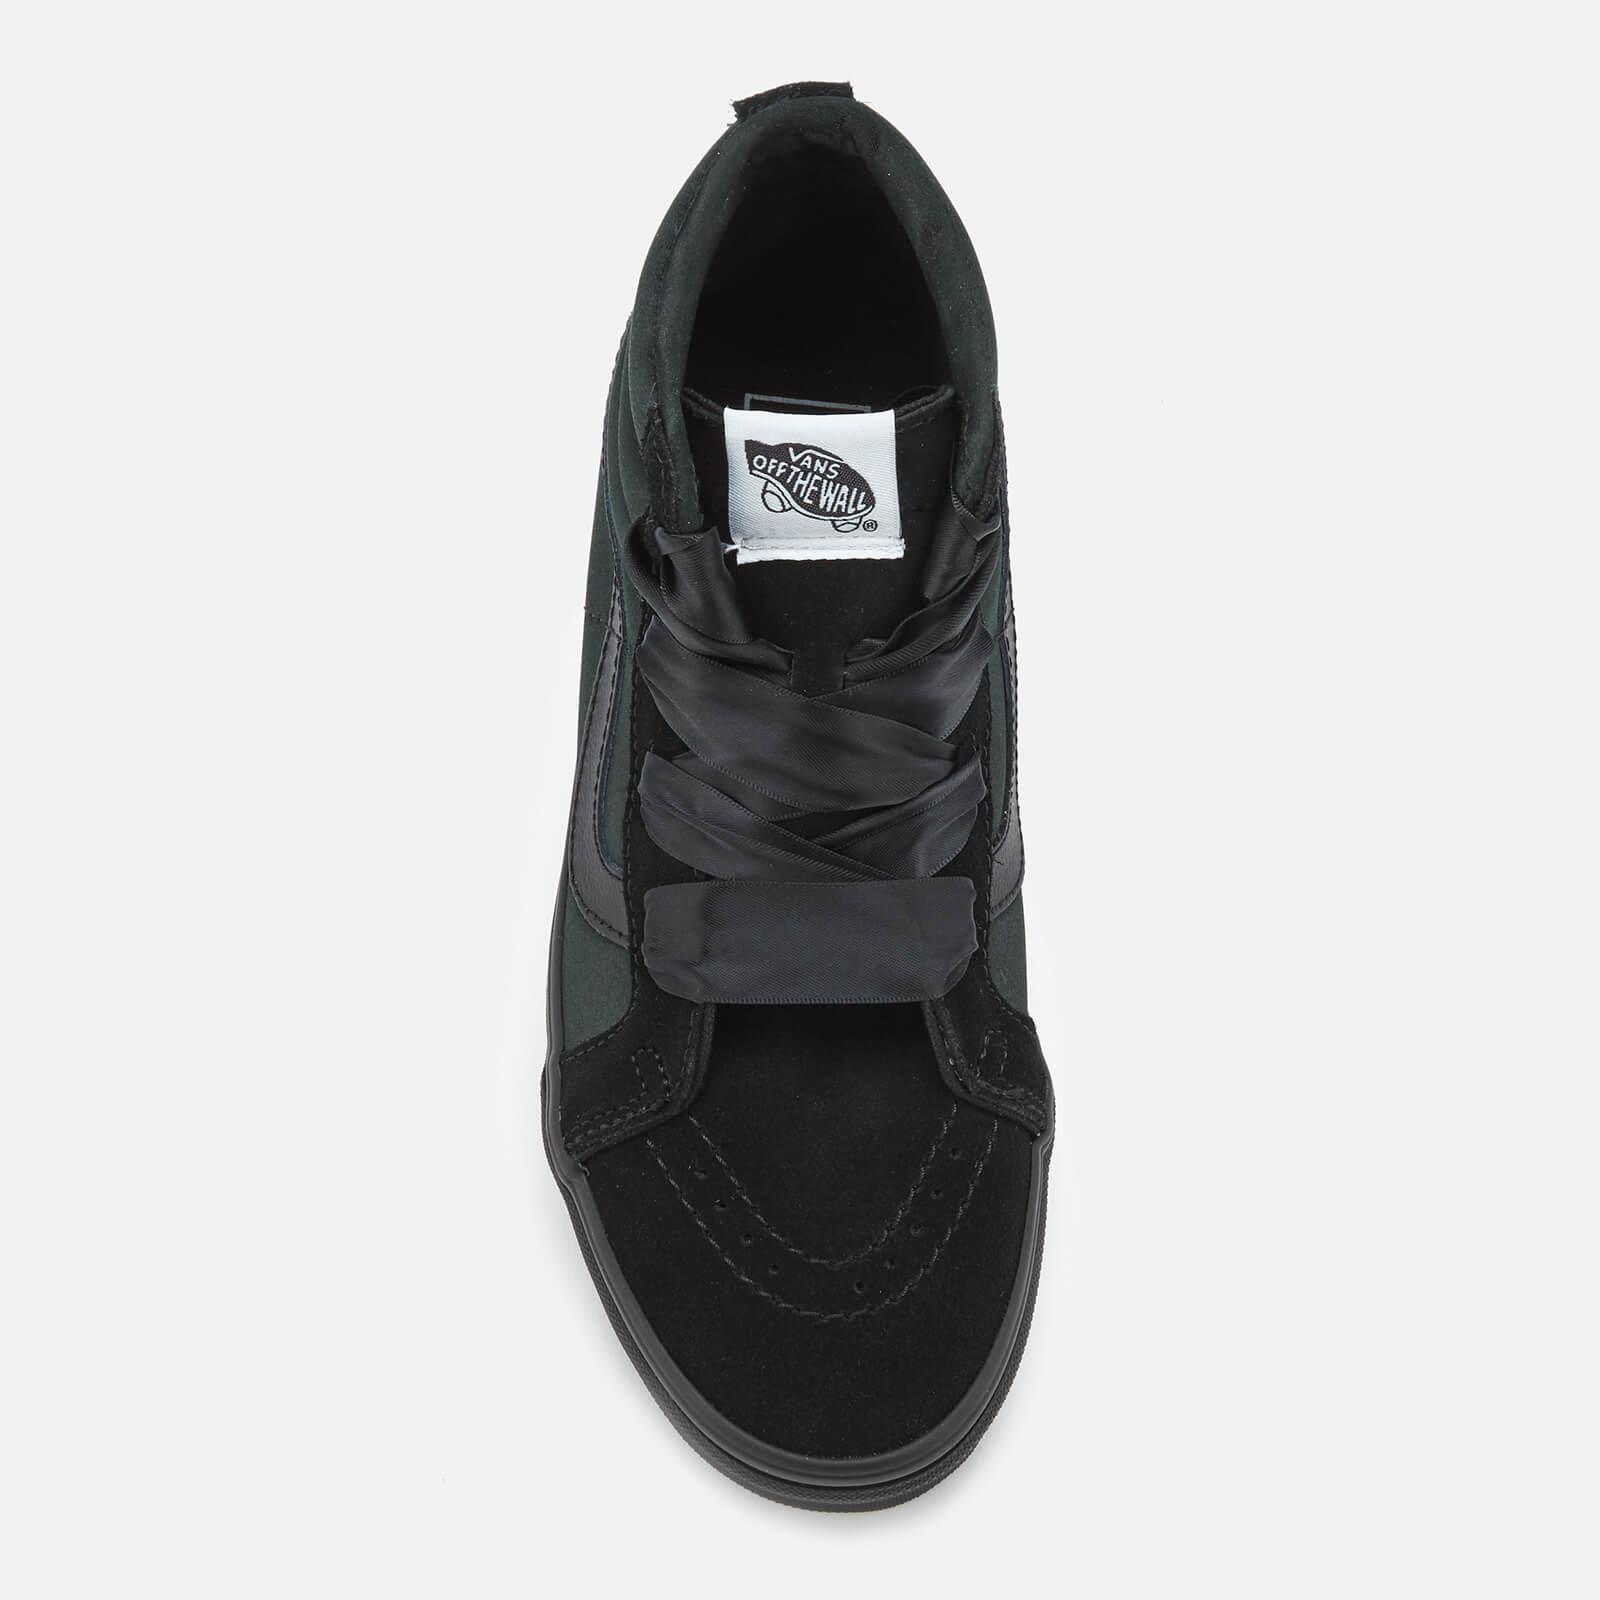 Lyst - Vans Sk8-hi Alt Lace Ballerina Trainers in Black 6f872181d